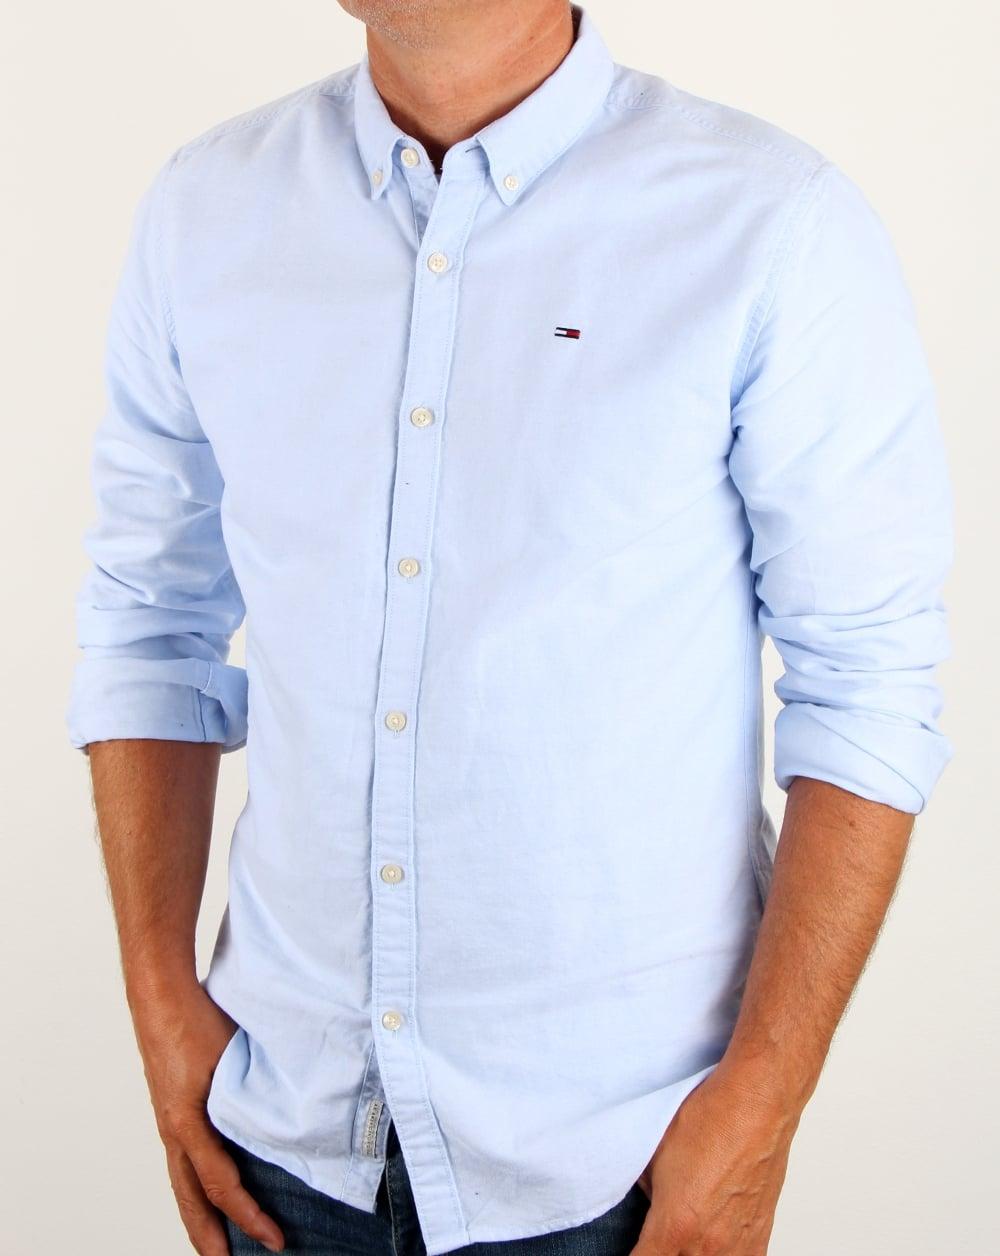 Tommy hilfiger cotton oxford shirt light blue long sleeve mens for Mens blue oxford shirt